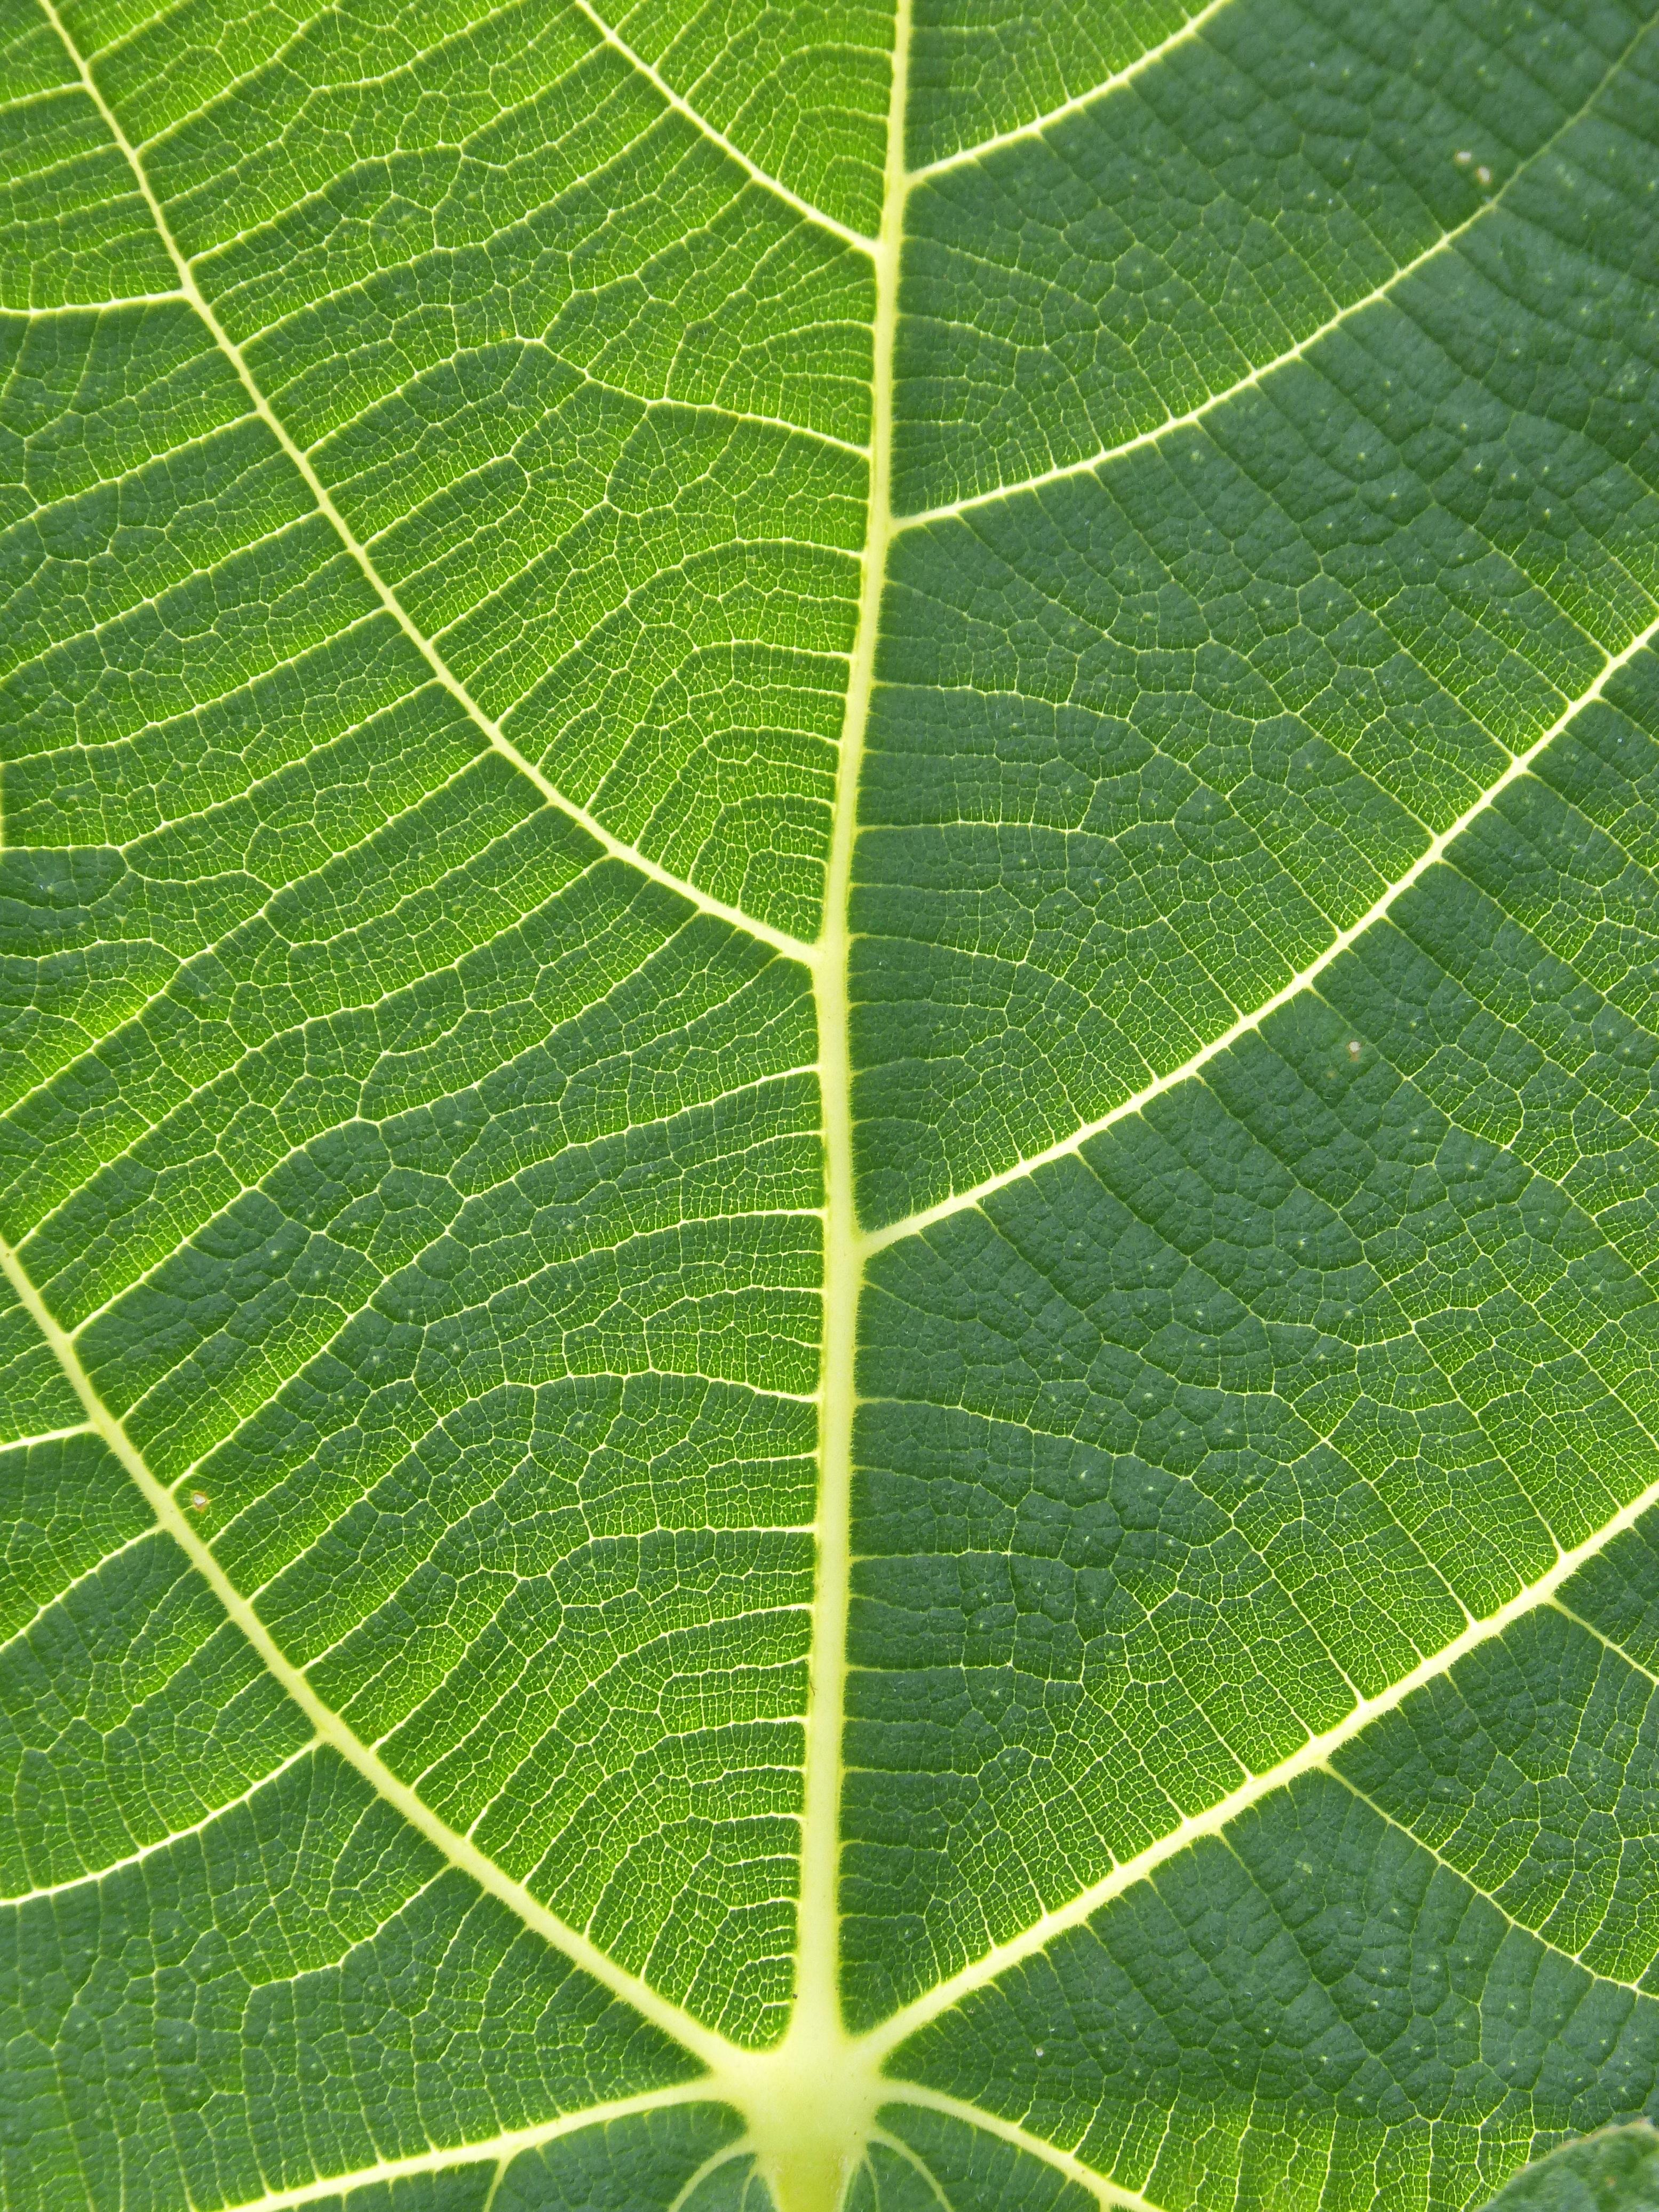 Fotos gratis : textura, hoja, flor, verde, Produce, botánica, flora ...